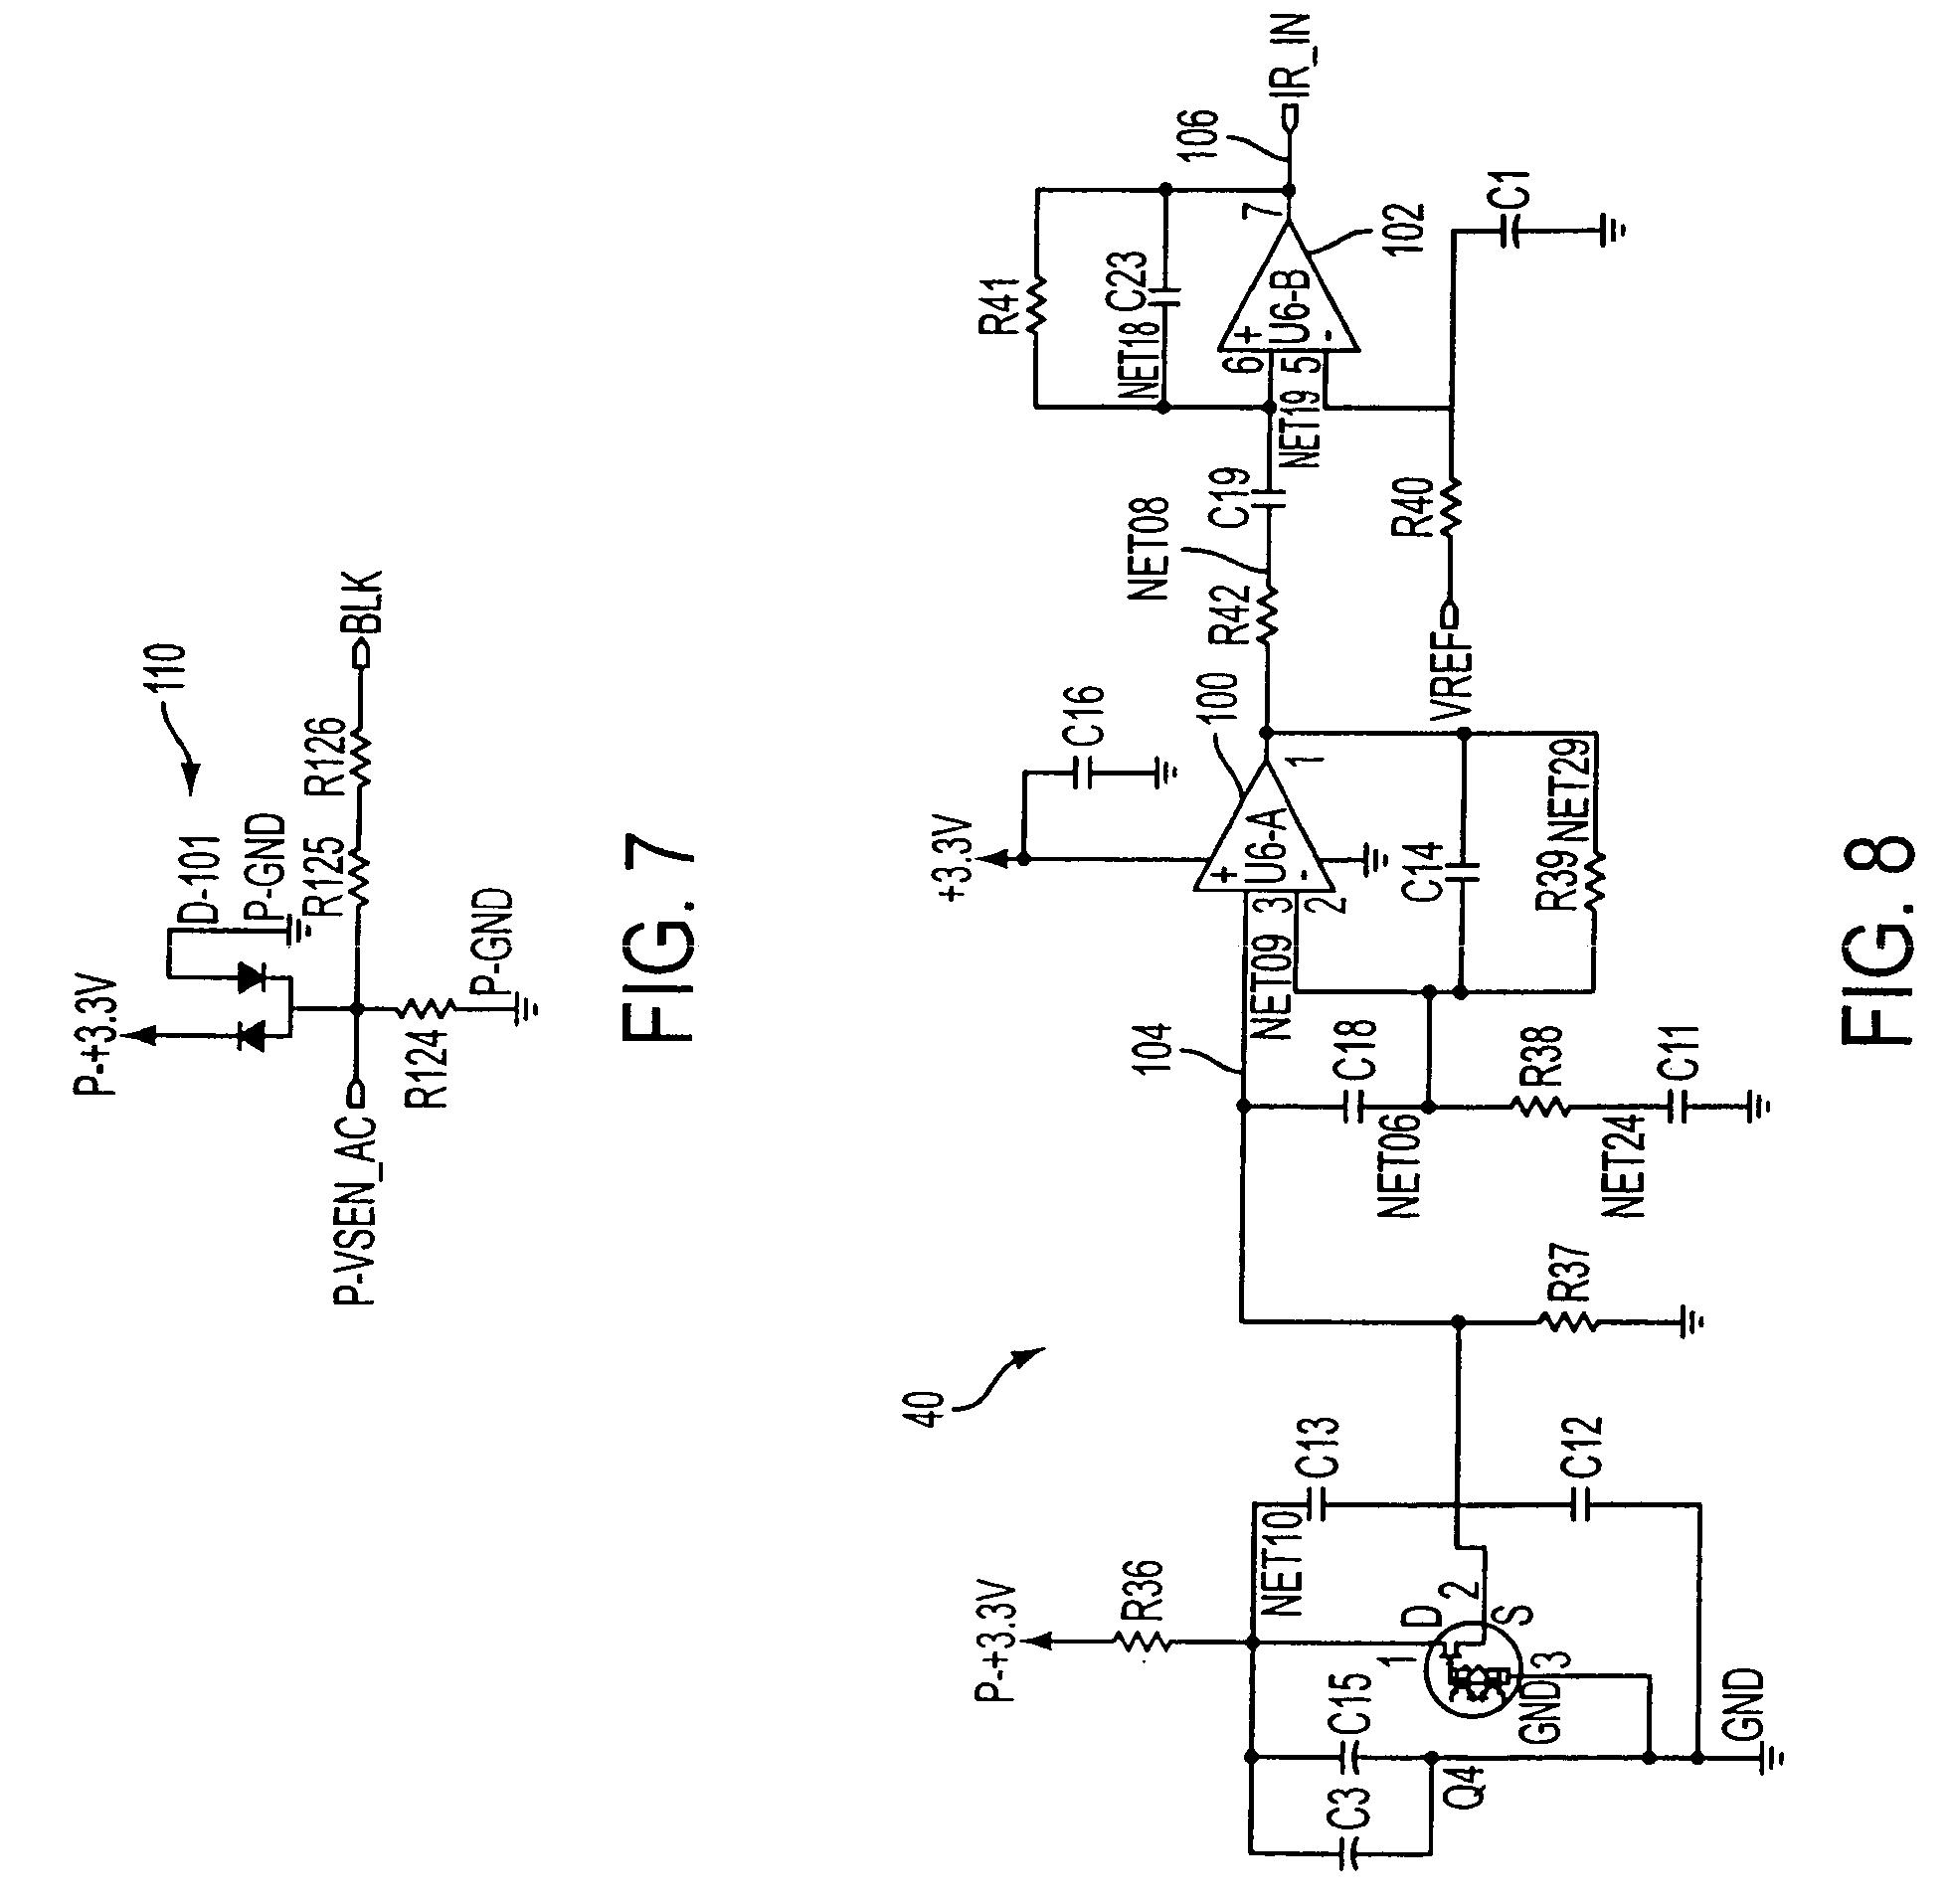 John Deere L110 Seat Switch Diagram Html